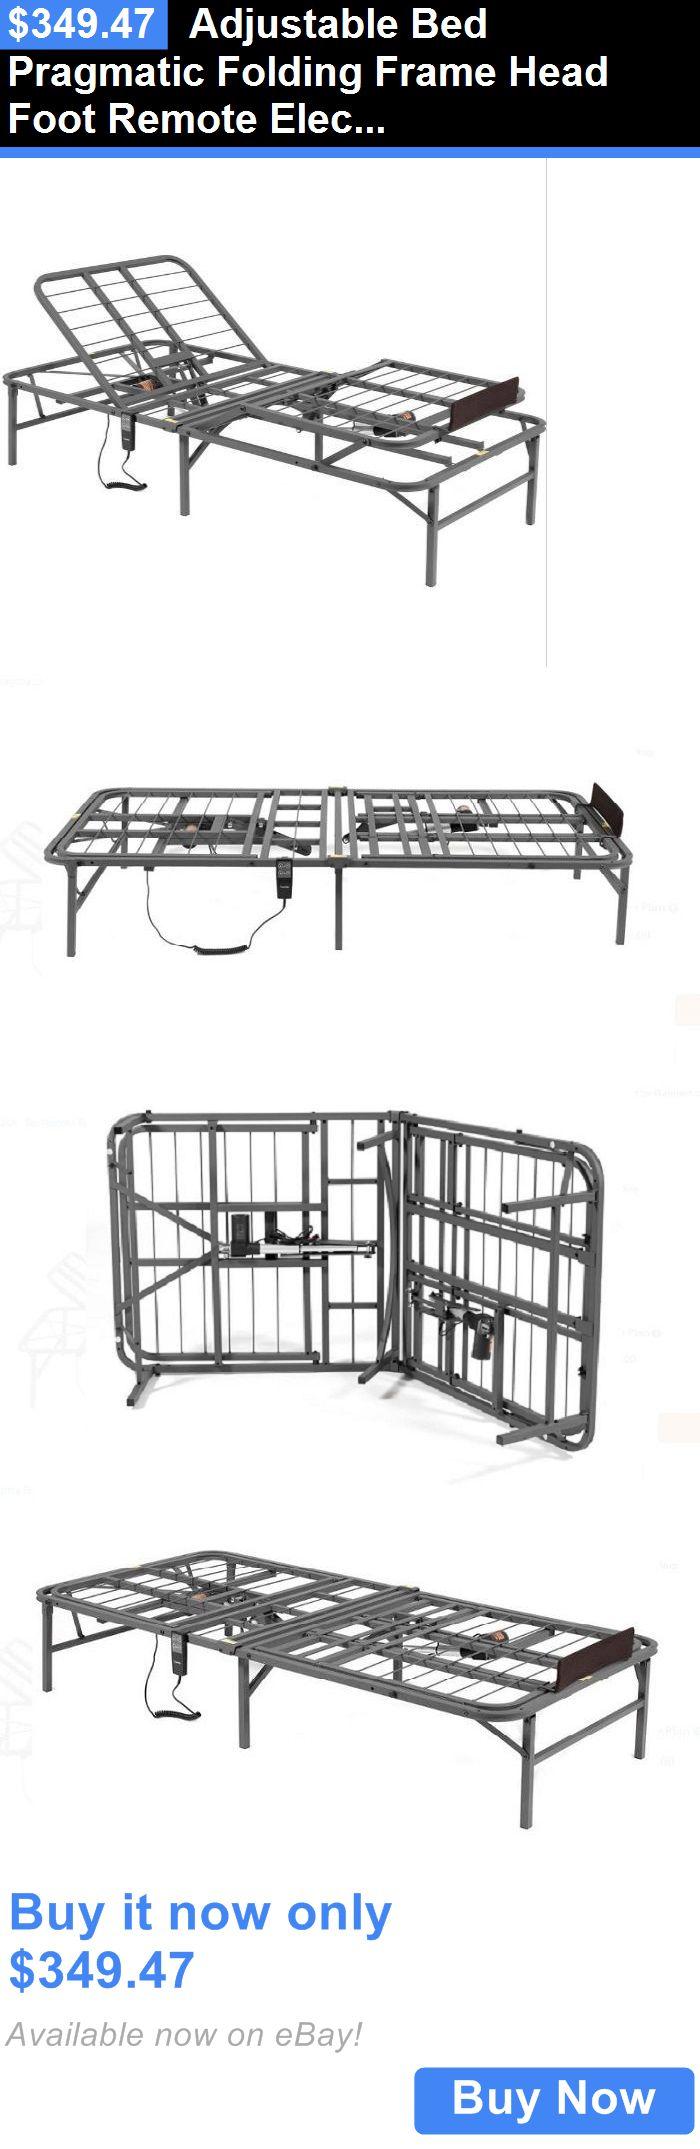 University loft graduate series twin xl open loft bed natural finish - Bedding Adjustable Bed Pragmatic Folding Frame Head Foot Remote Electric Motor Twin Xl Buy It